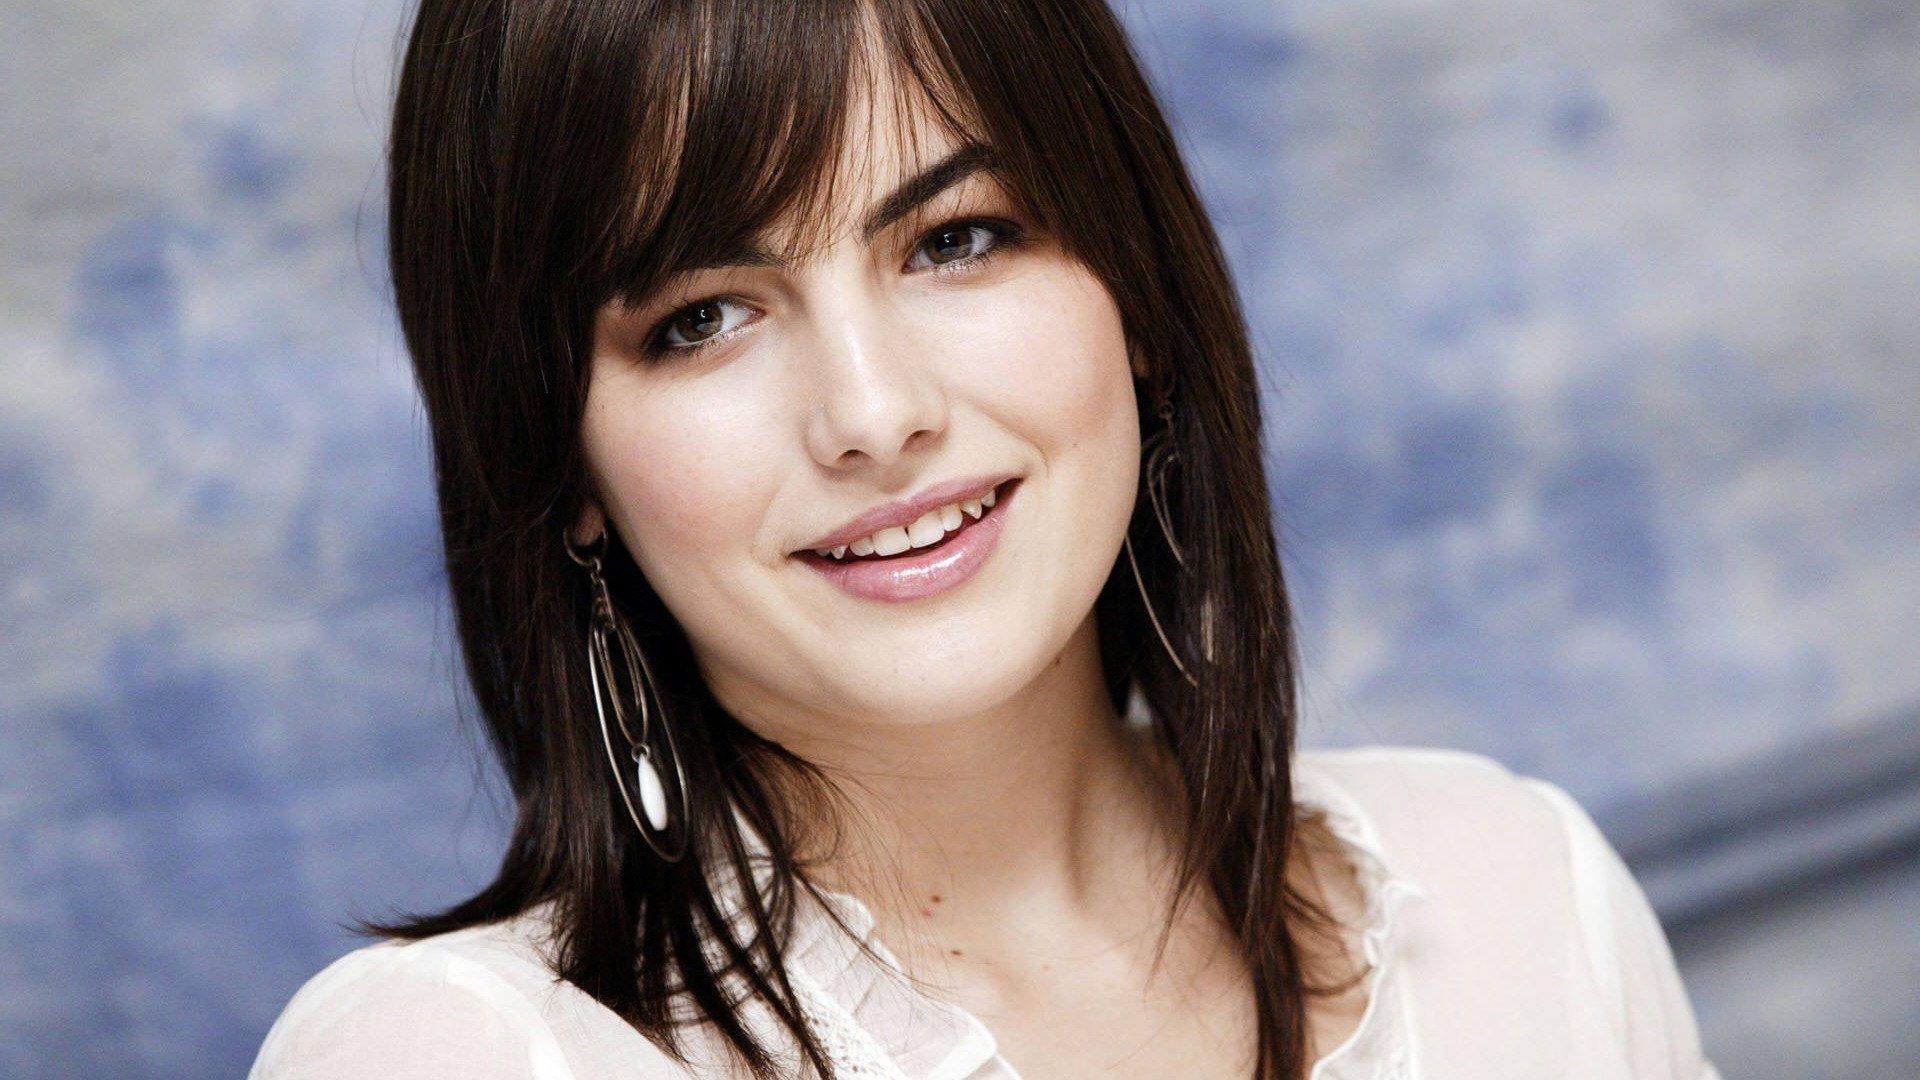 Wallpaper camilla belle hd wallpapers - Hollywood actress full hd wallpaper ...